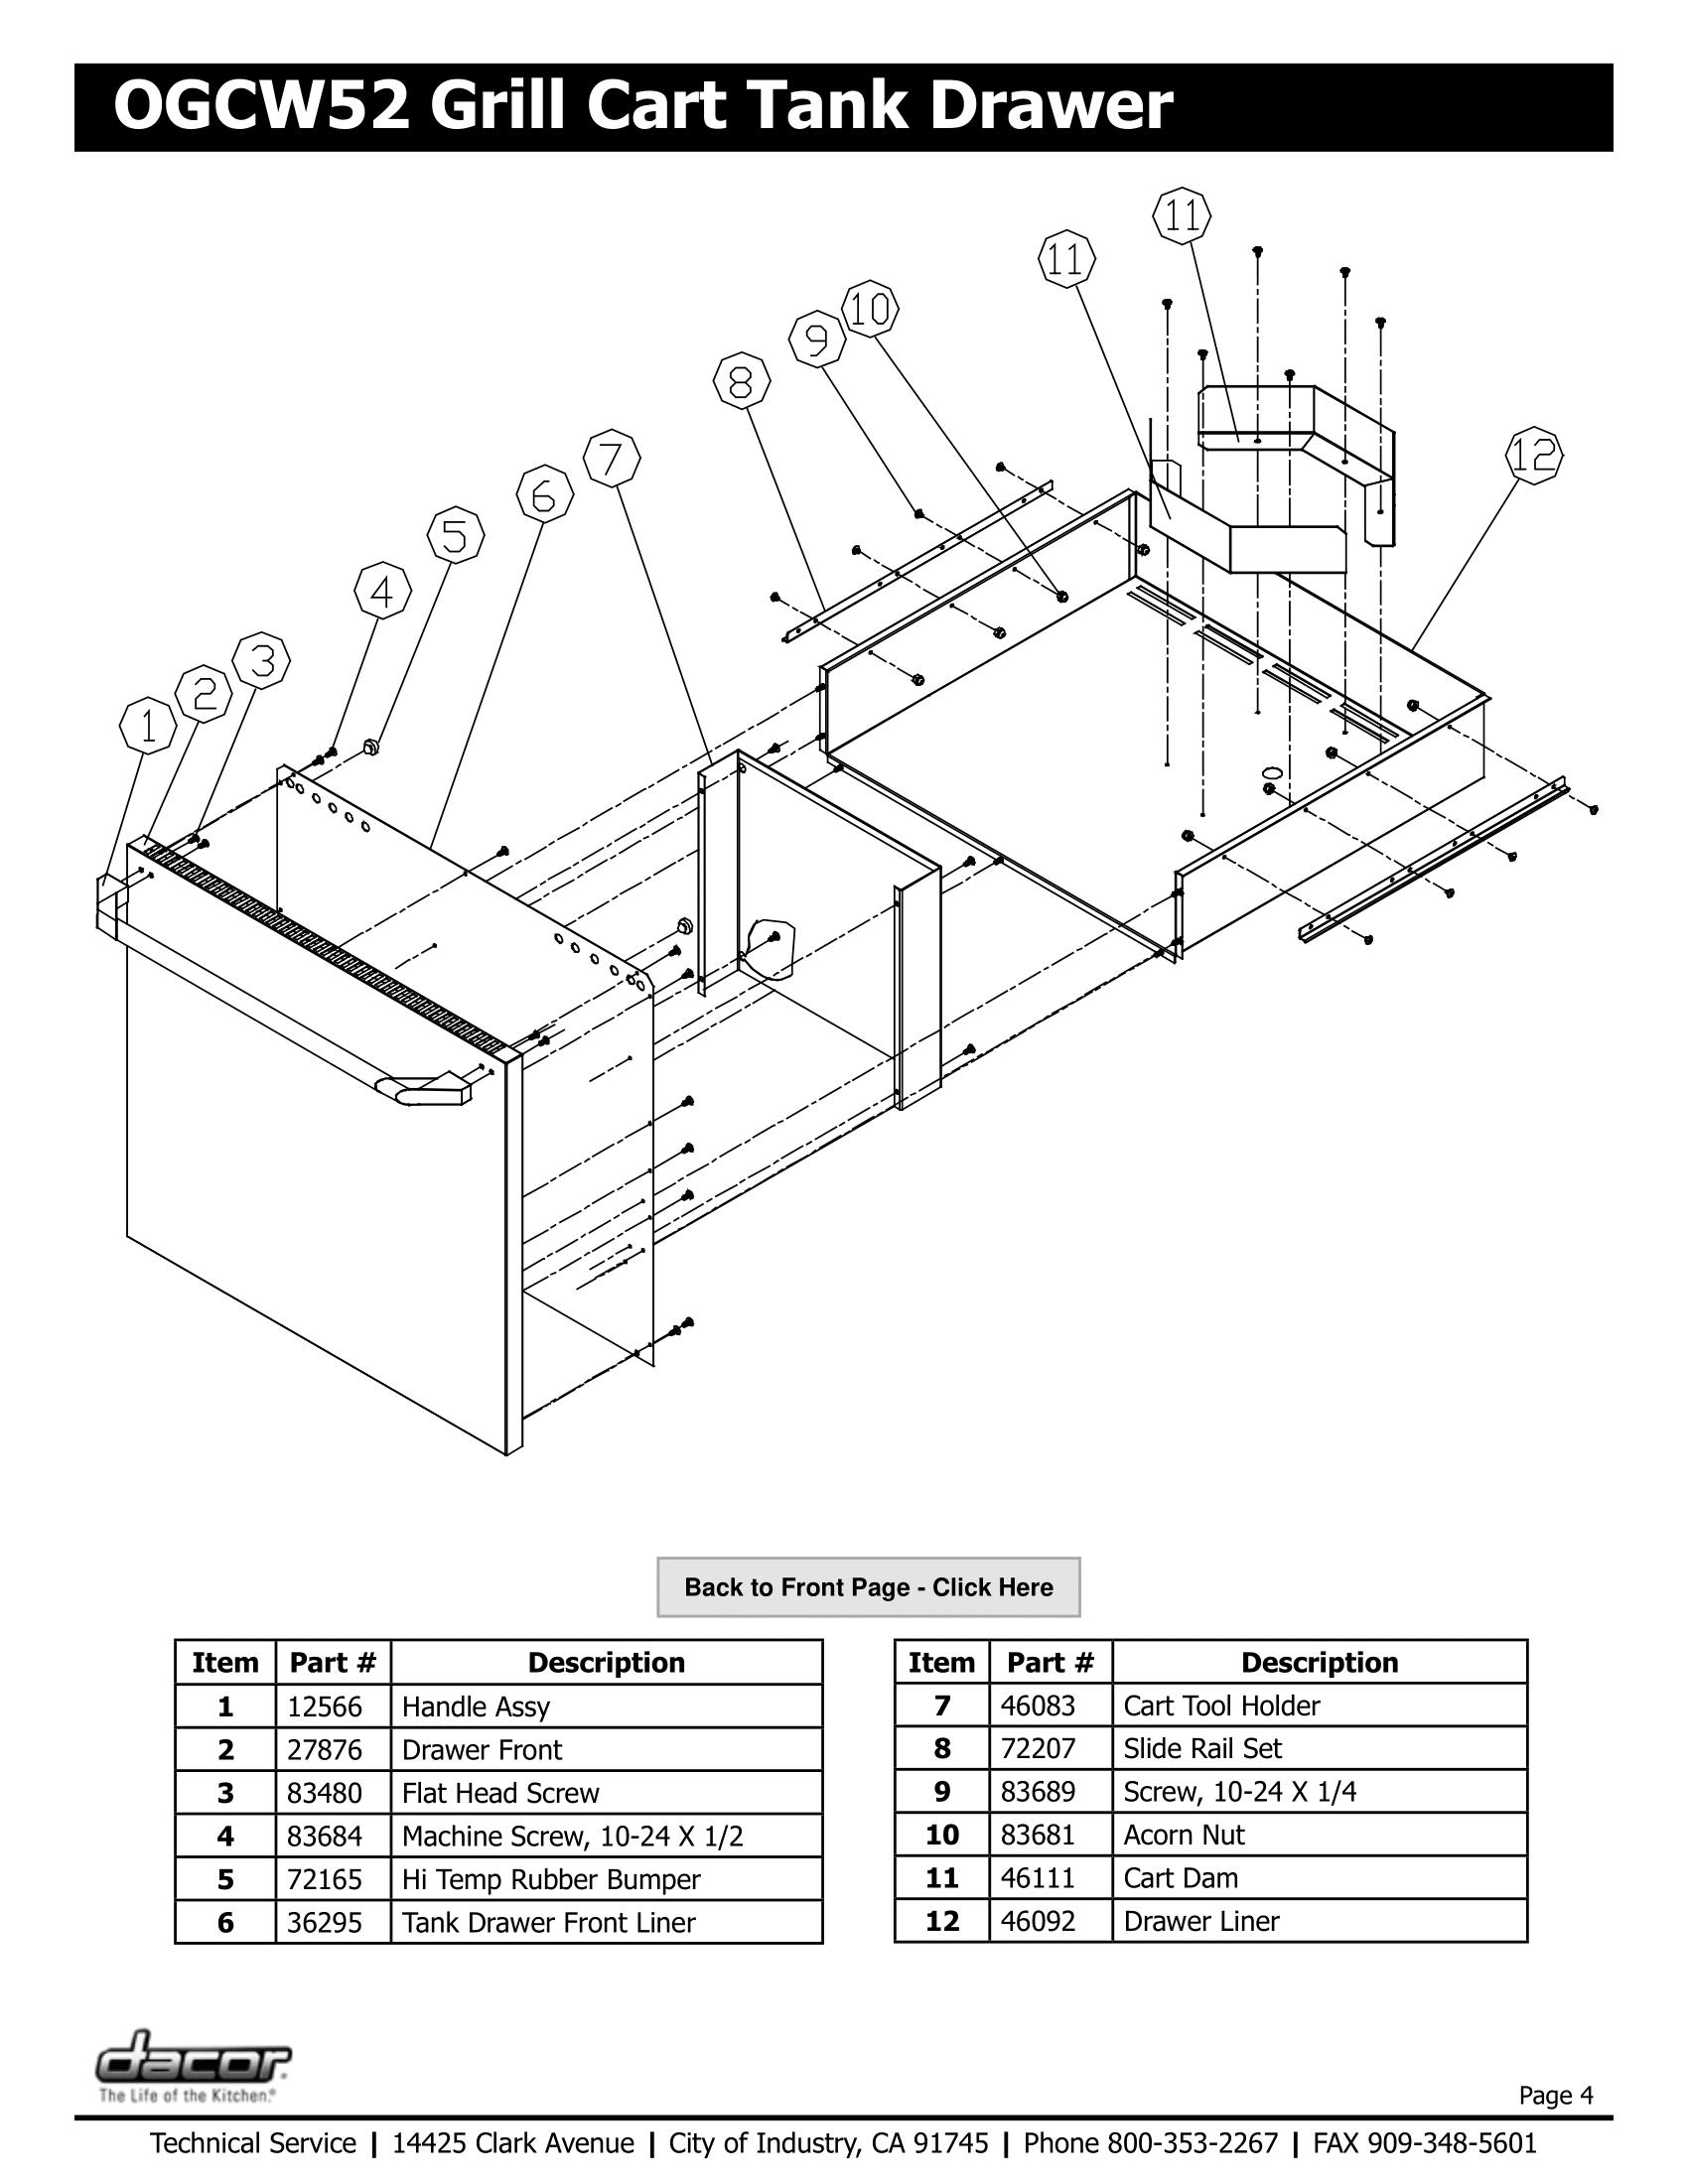 Dacor OGCW52 Tank Drawer Schematic